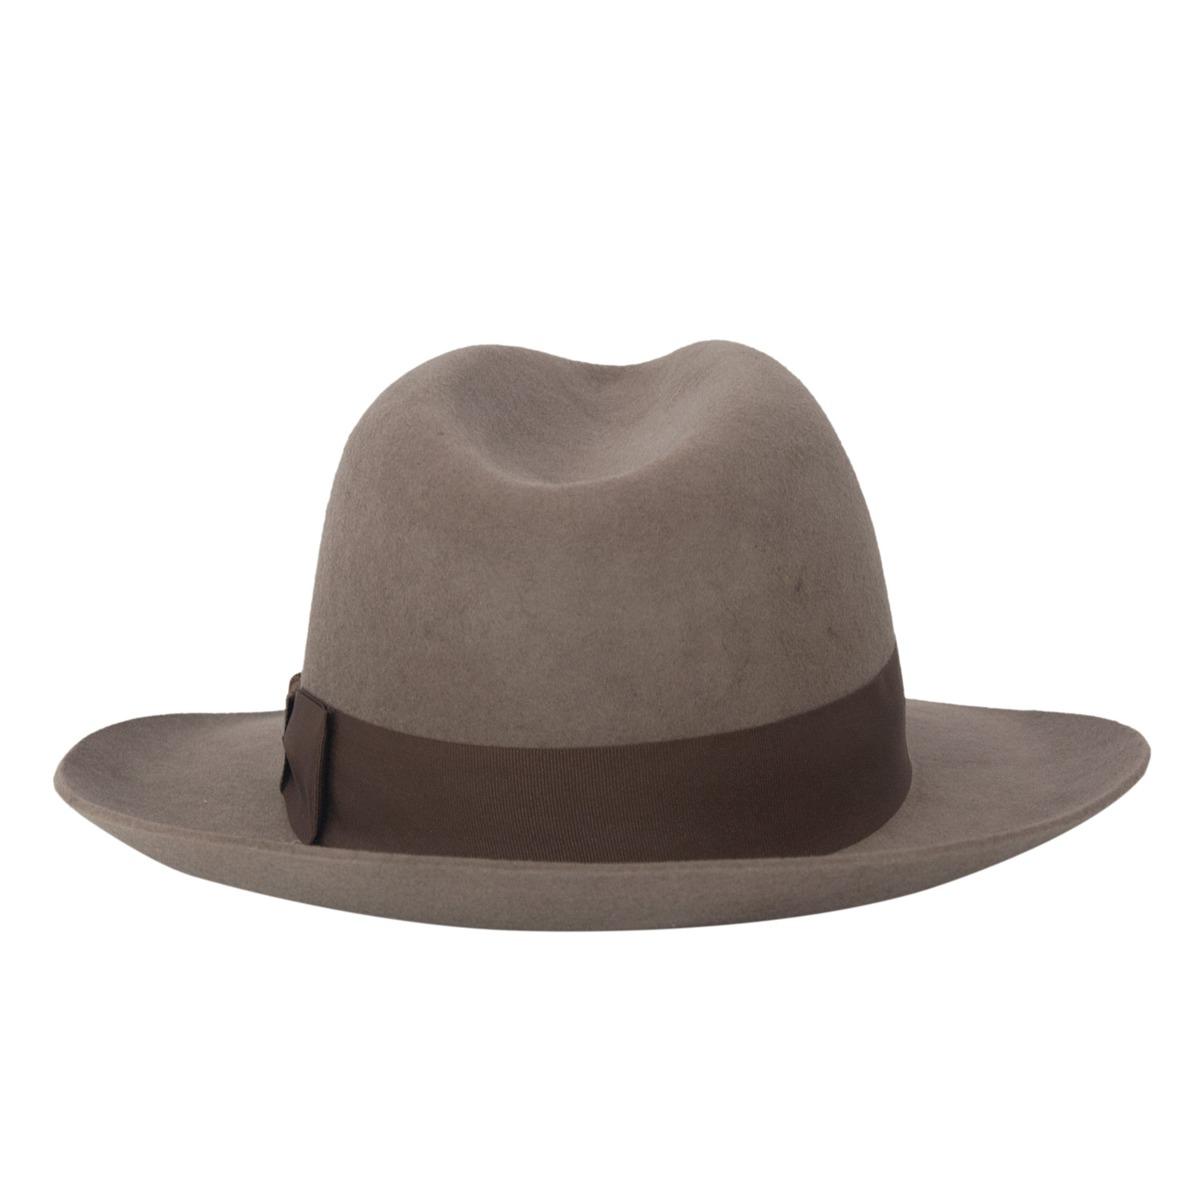 chapéu social masculino gangster johnny depp. Carregando zoom. faf95dac2ce